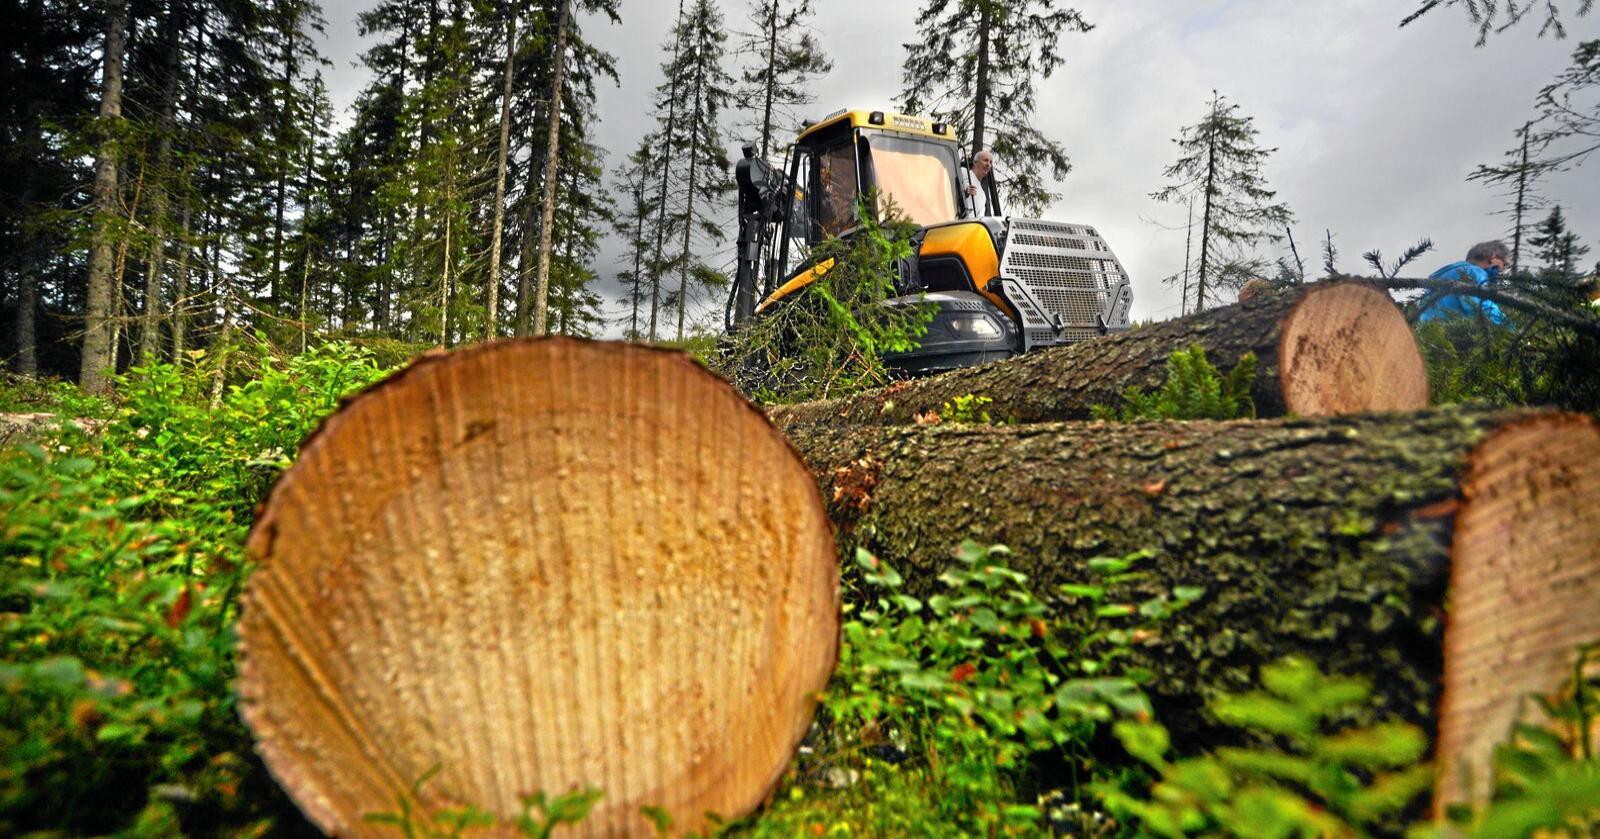 Skog: Det er skapt inntrykk av at EU ville forby flatehogst. Foto: Siri Juell Rasmussen